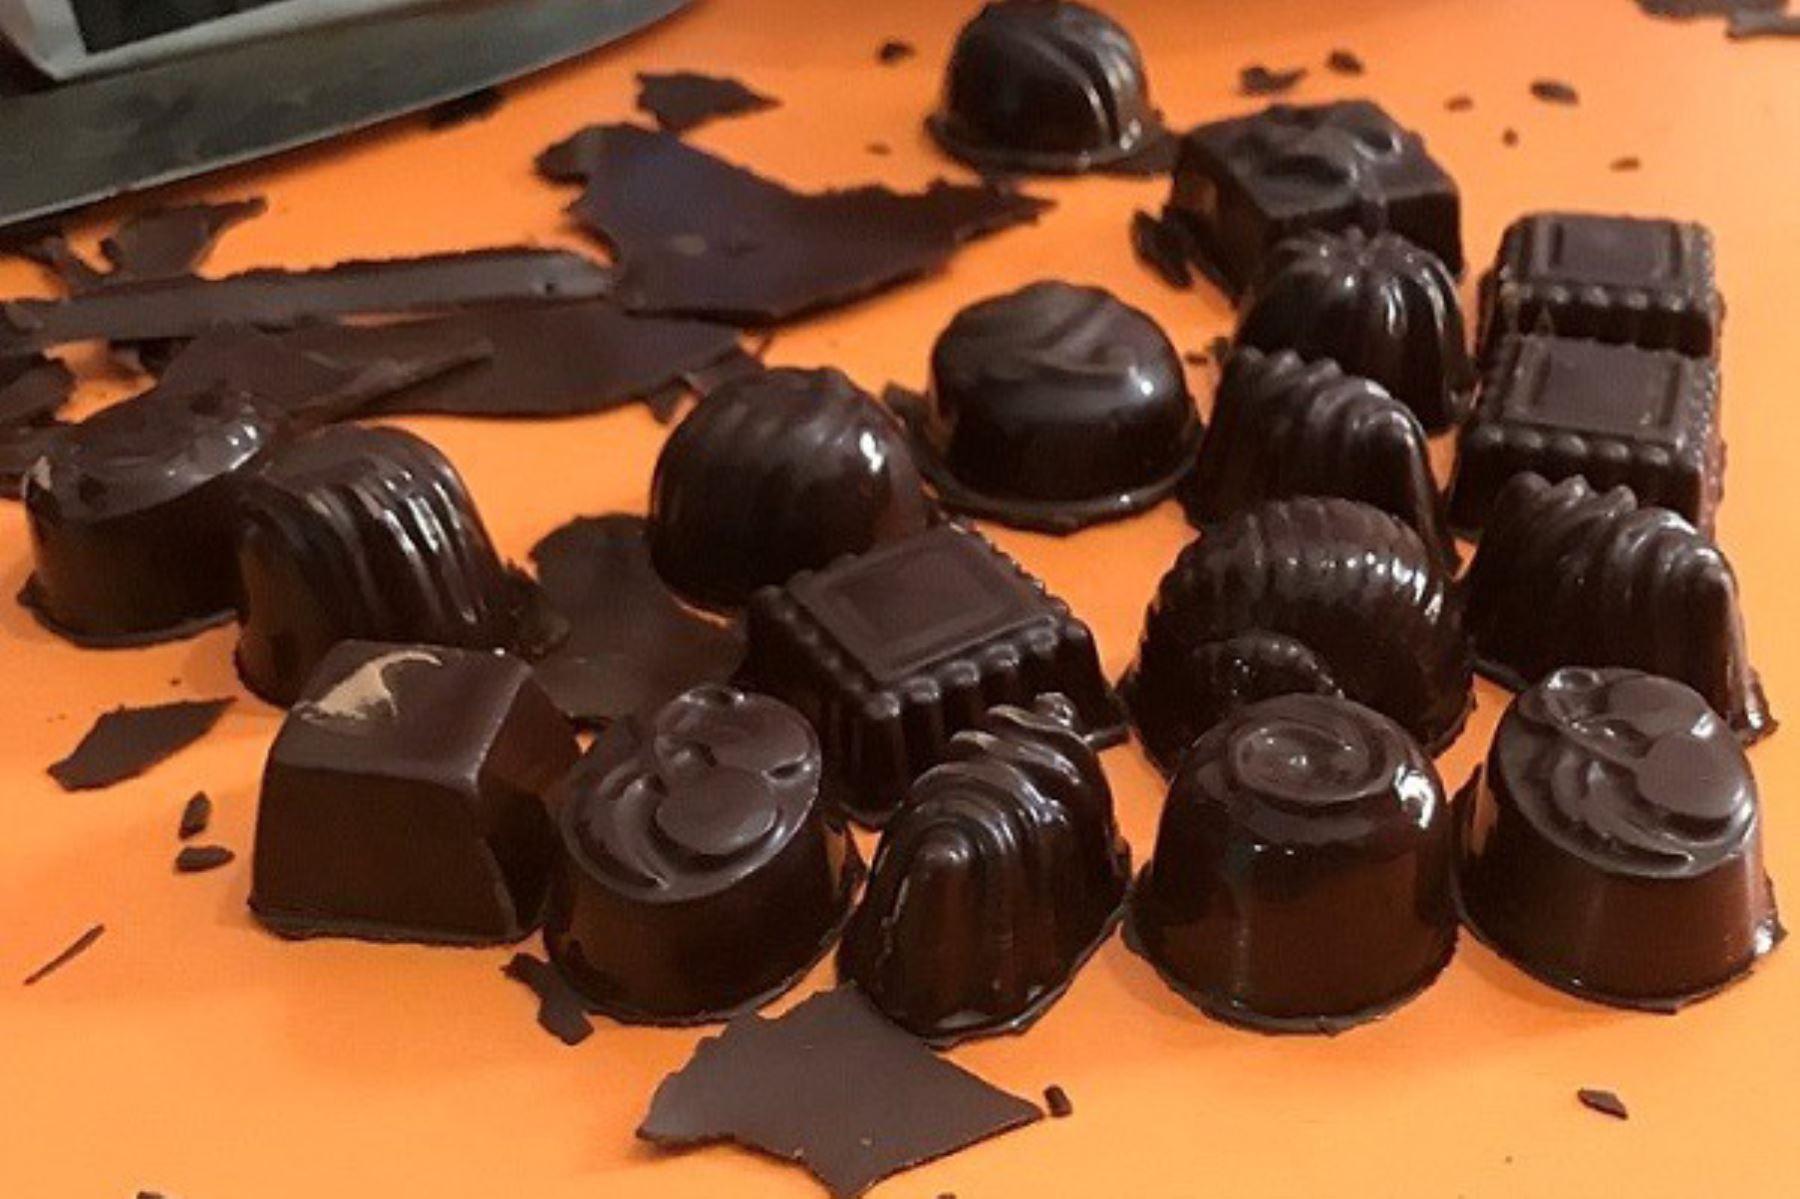 Produce e Indecopi trabajan marca colectiva para chocolate peruano